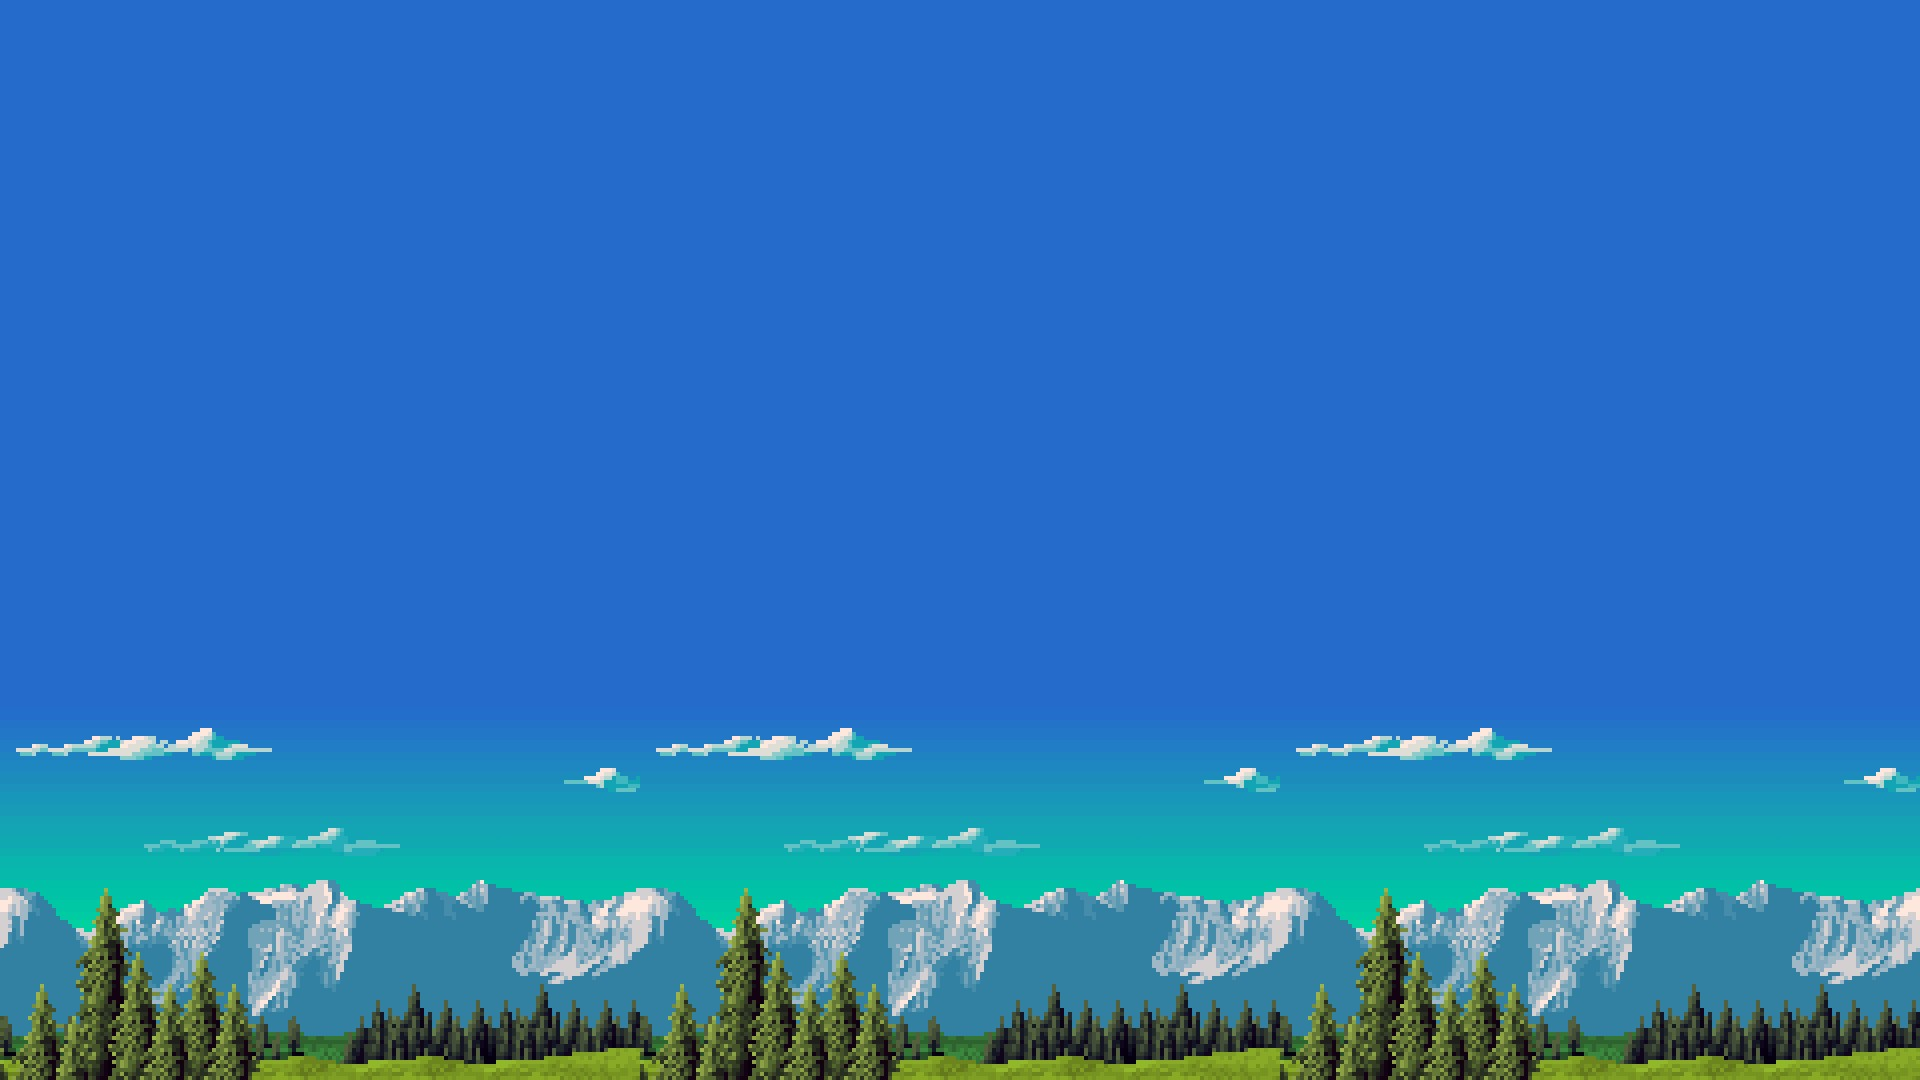 Download Free 3d Wallpapers For Windows 8 Hd 8 Bit Backgrounds Pixelstalk Net